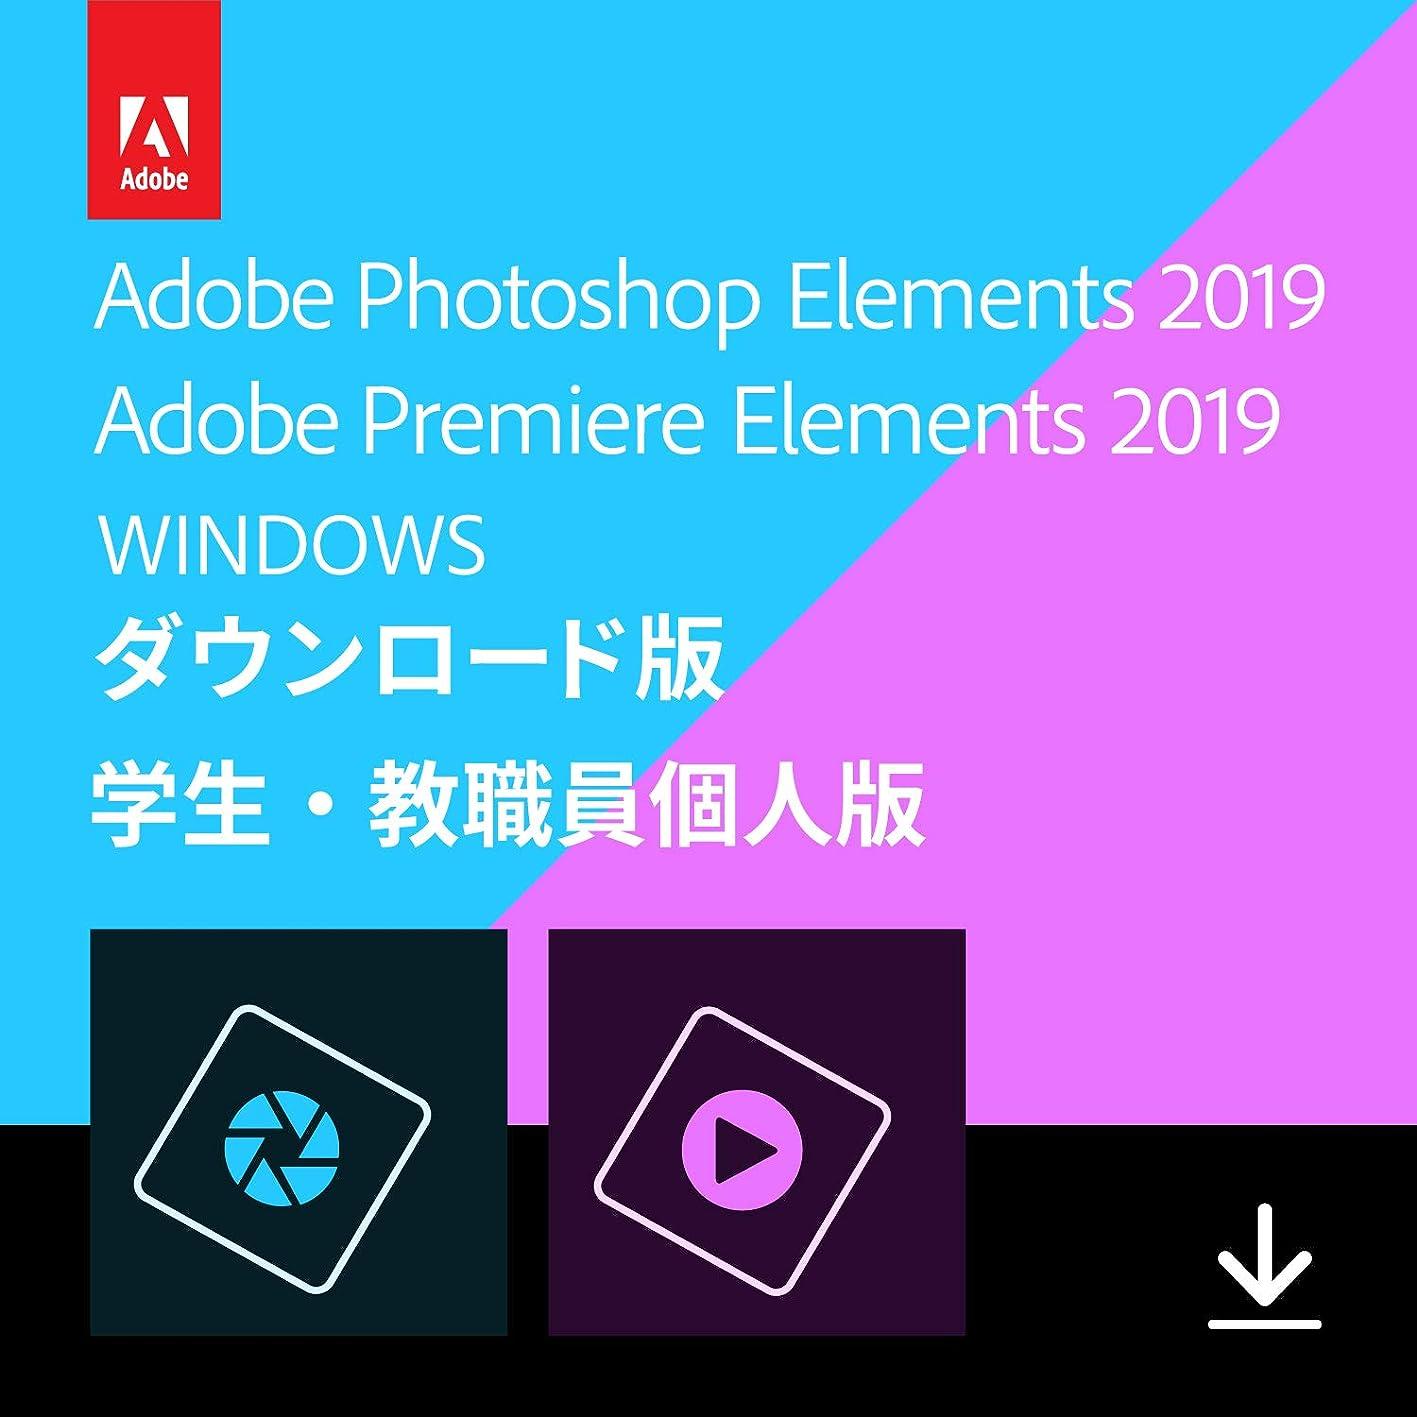 処方する骨折欲望Adobe Photoshop Elements 2019 & Adobe Premiere Elements 2019 学生?教職員個人版 Windows版 DL